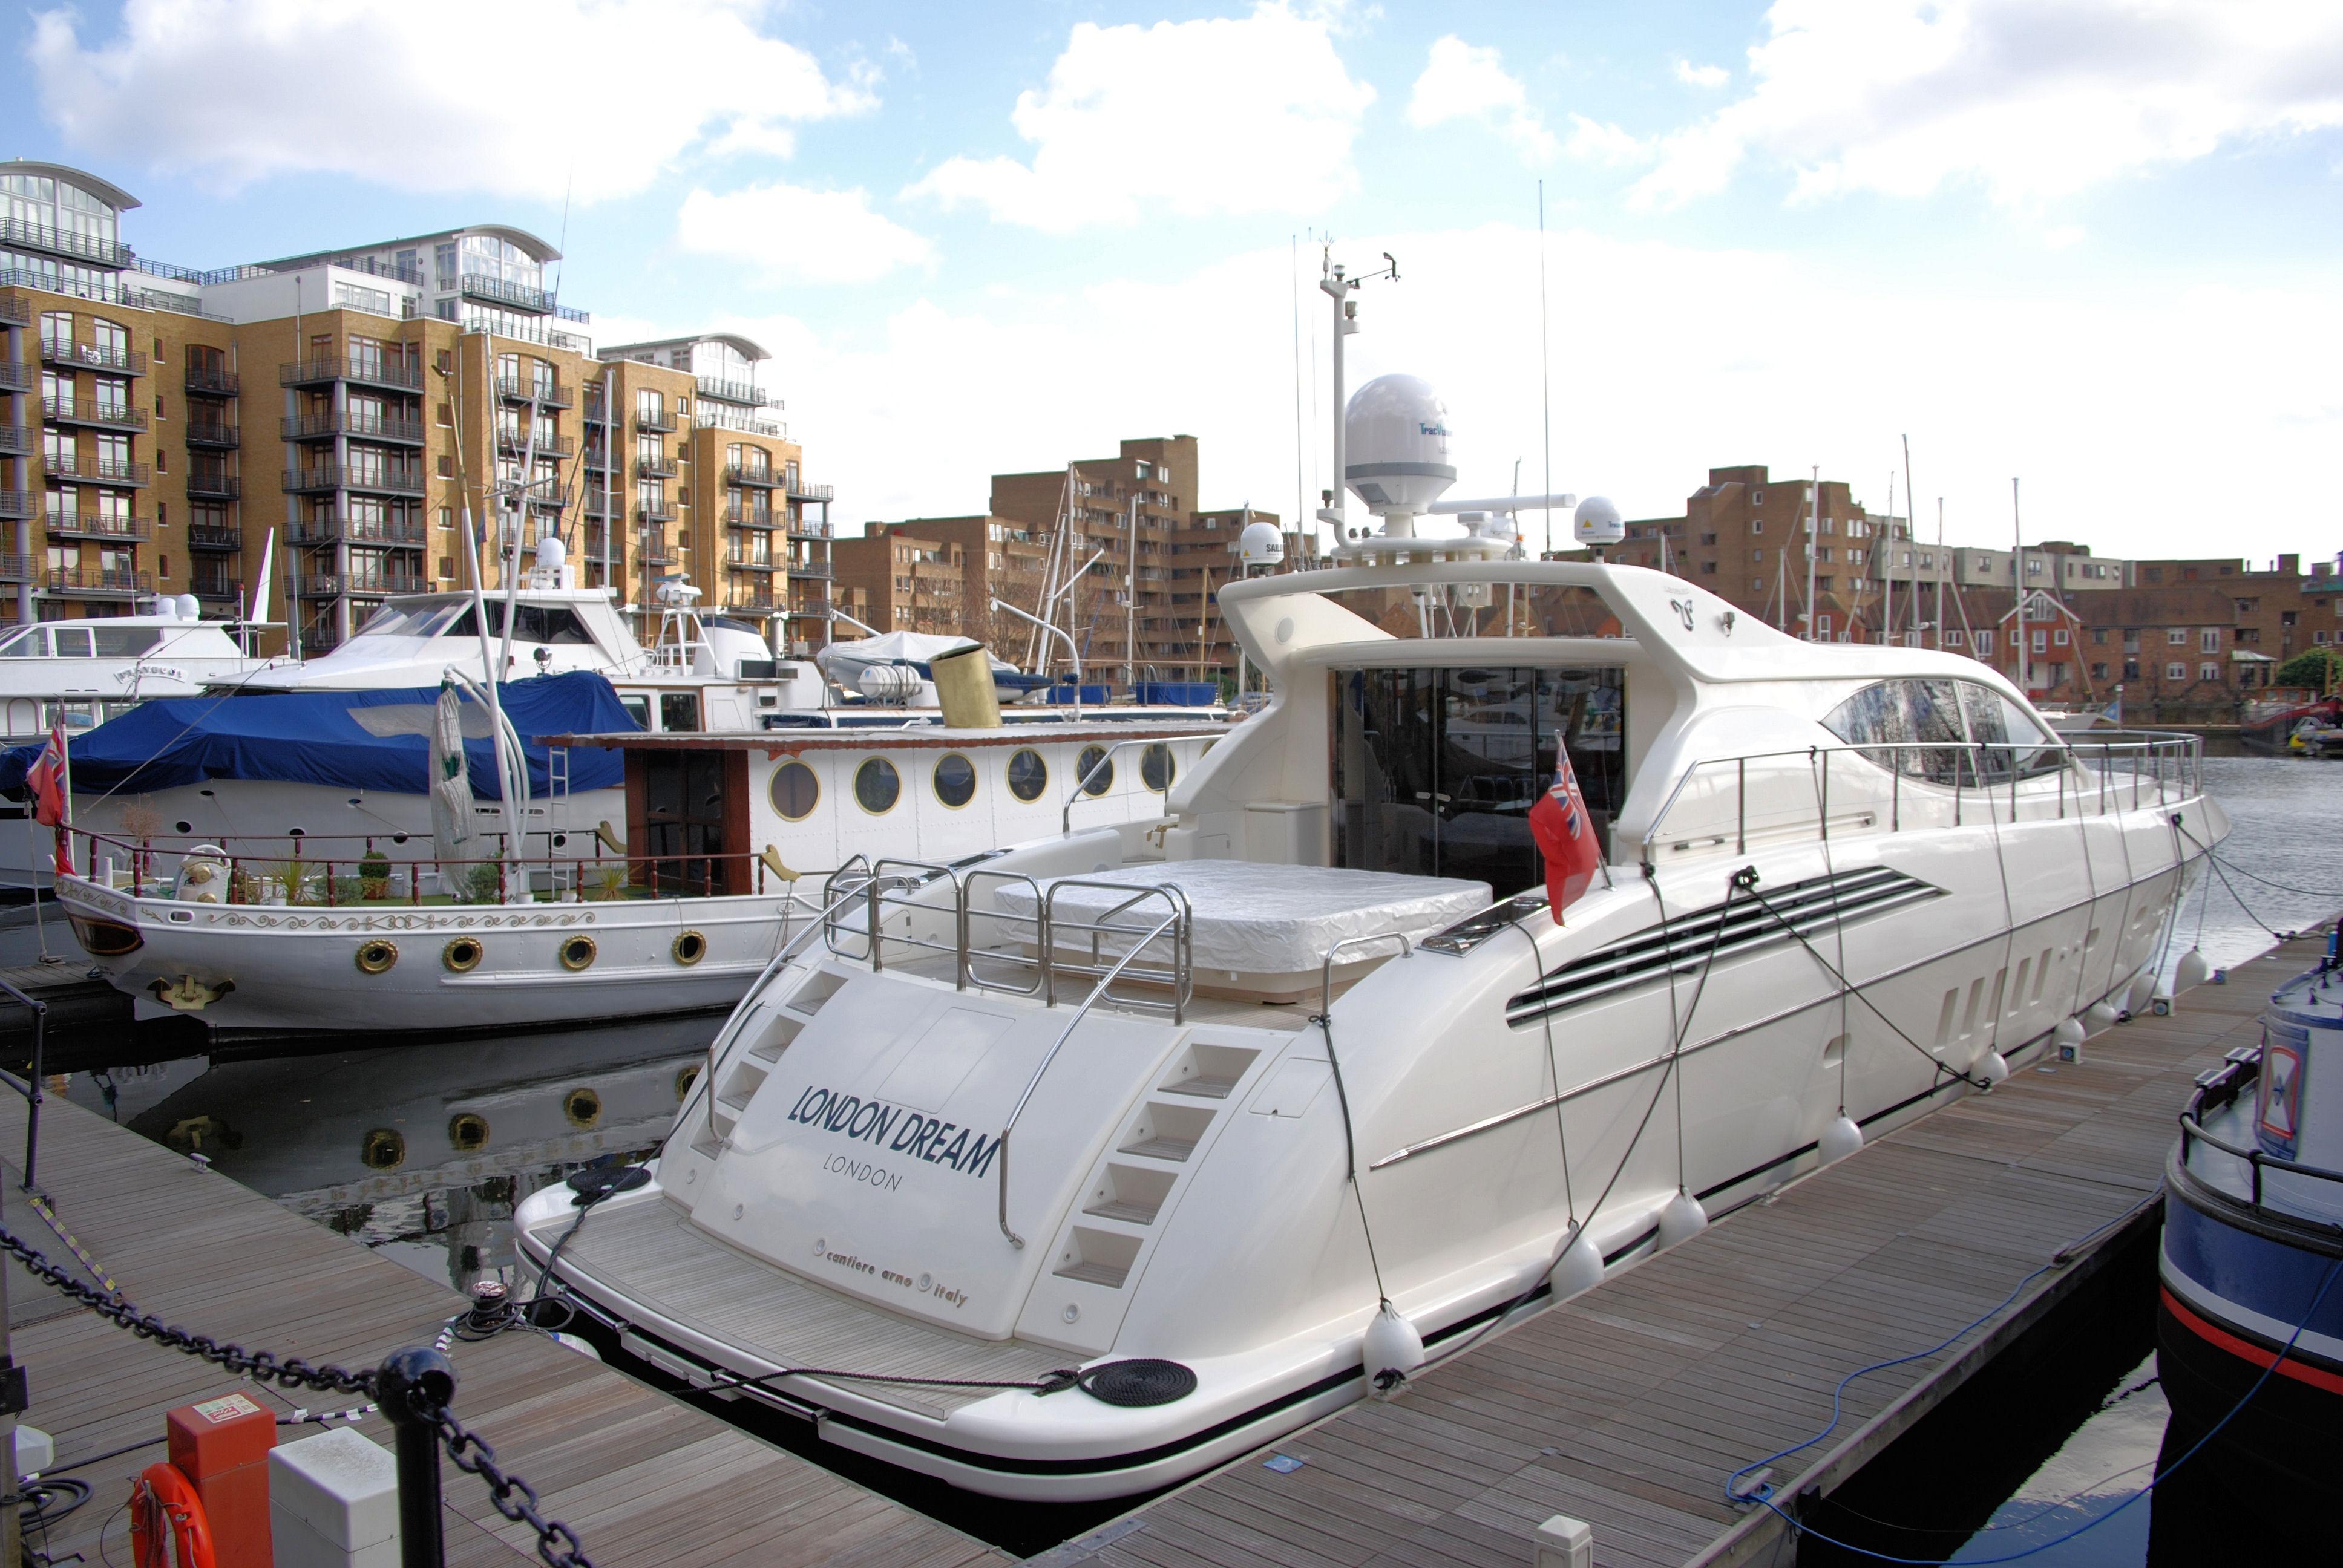 Dock Boat Ship Transport Vehicle Yacht Holiday Marina London Relaxation Apartments Watercraft Yachts Ecosystem Motor